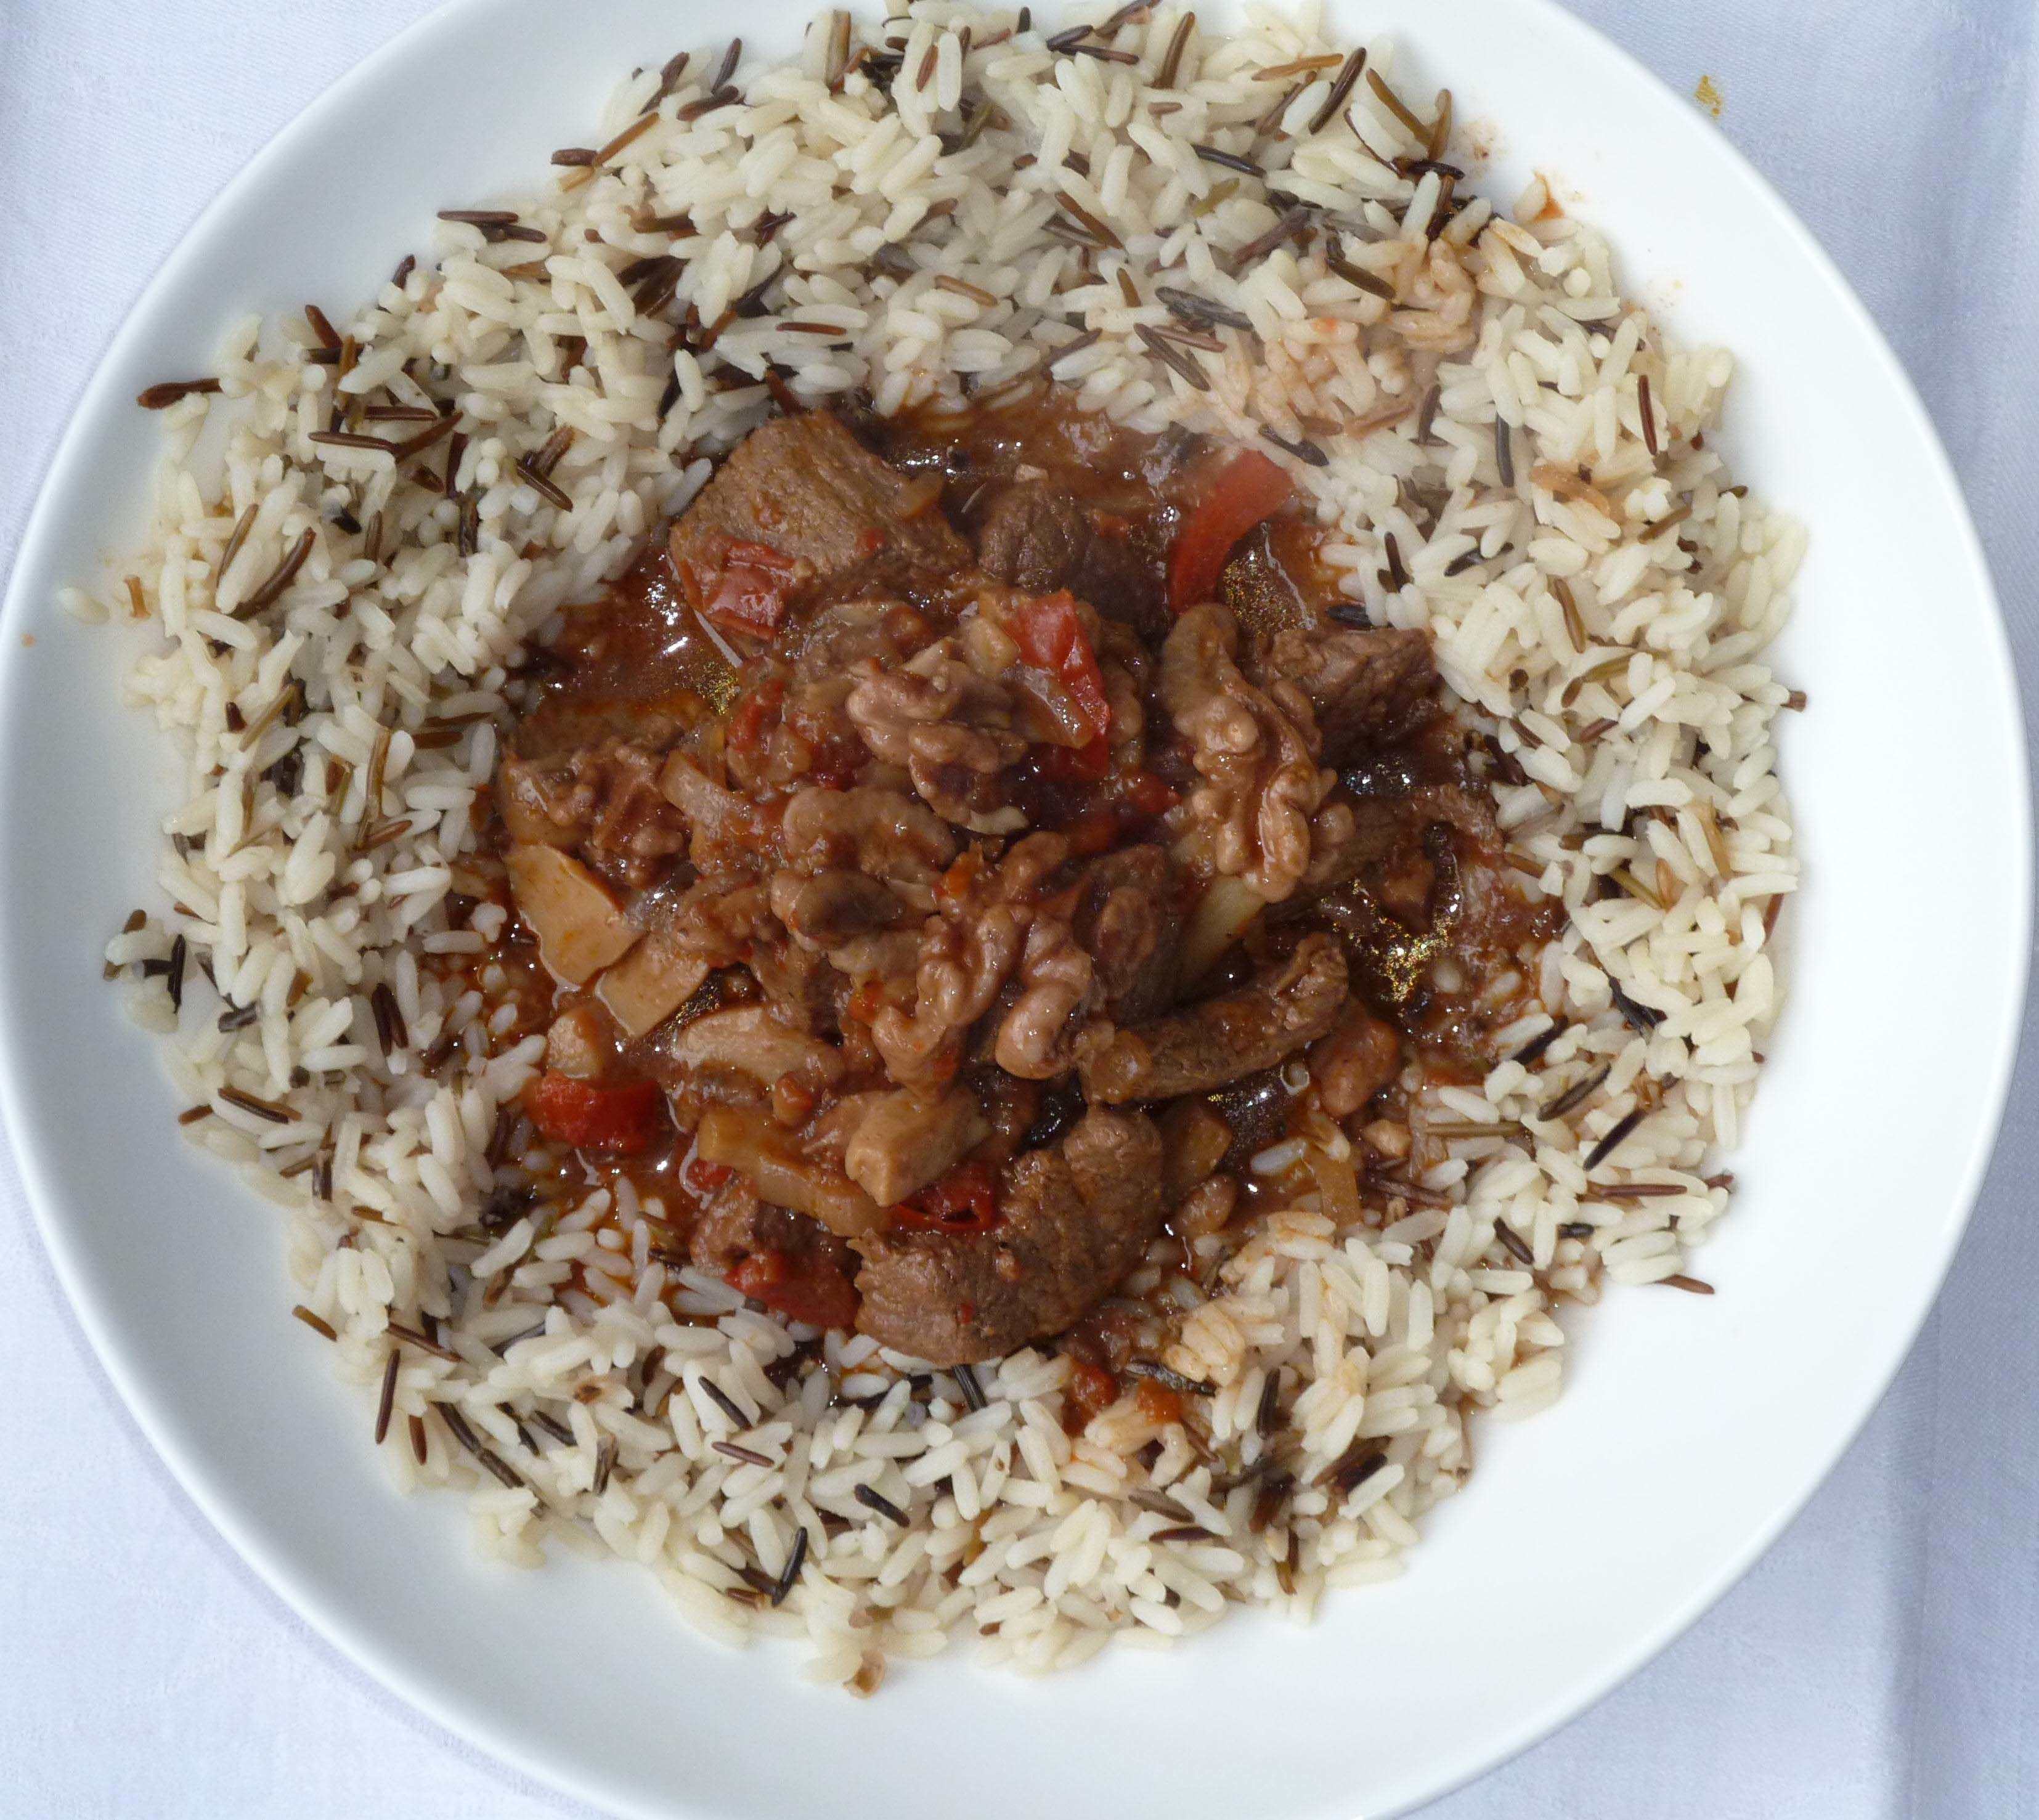 Beef Stew Allrecipes  Beef and walnut stew recipe All recipes UK